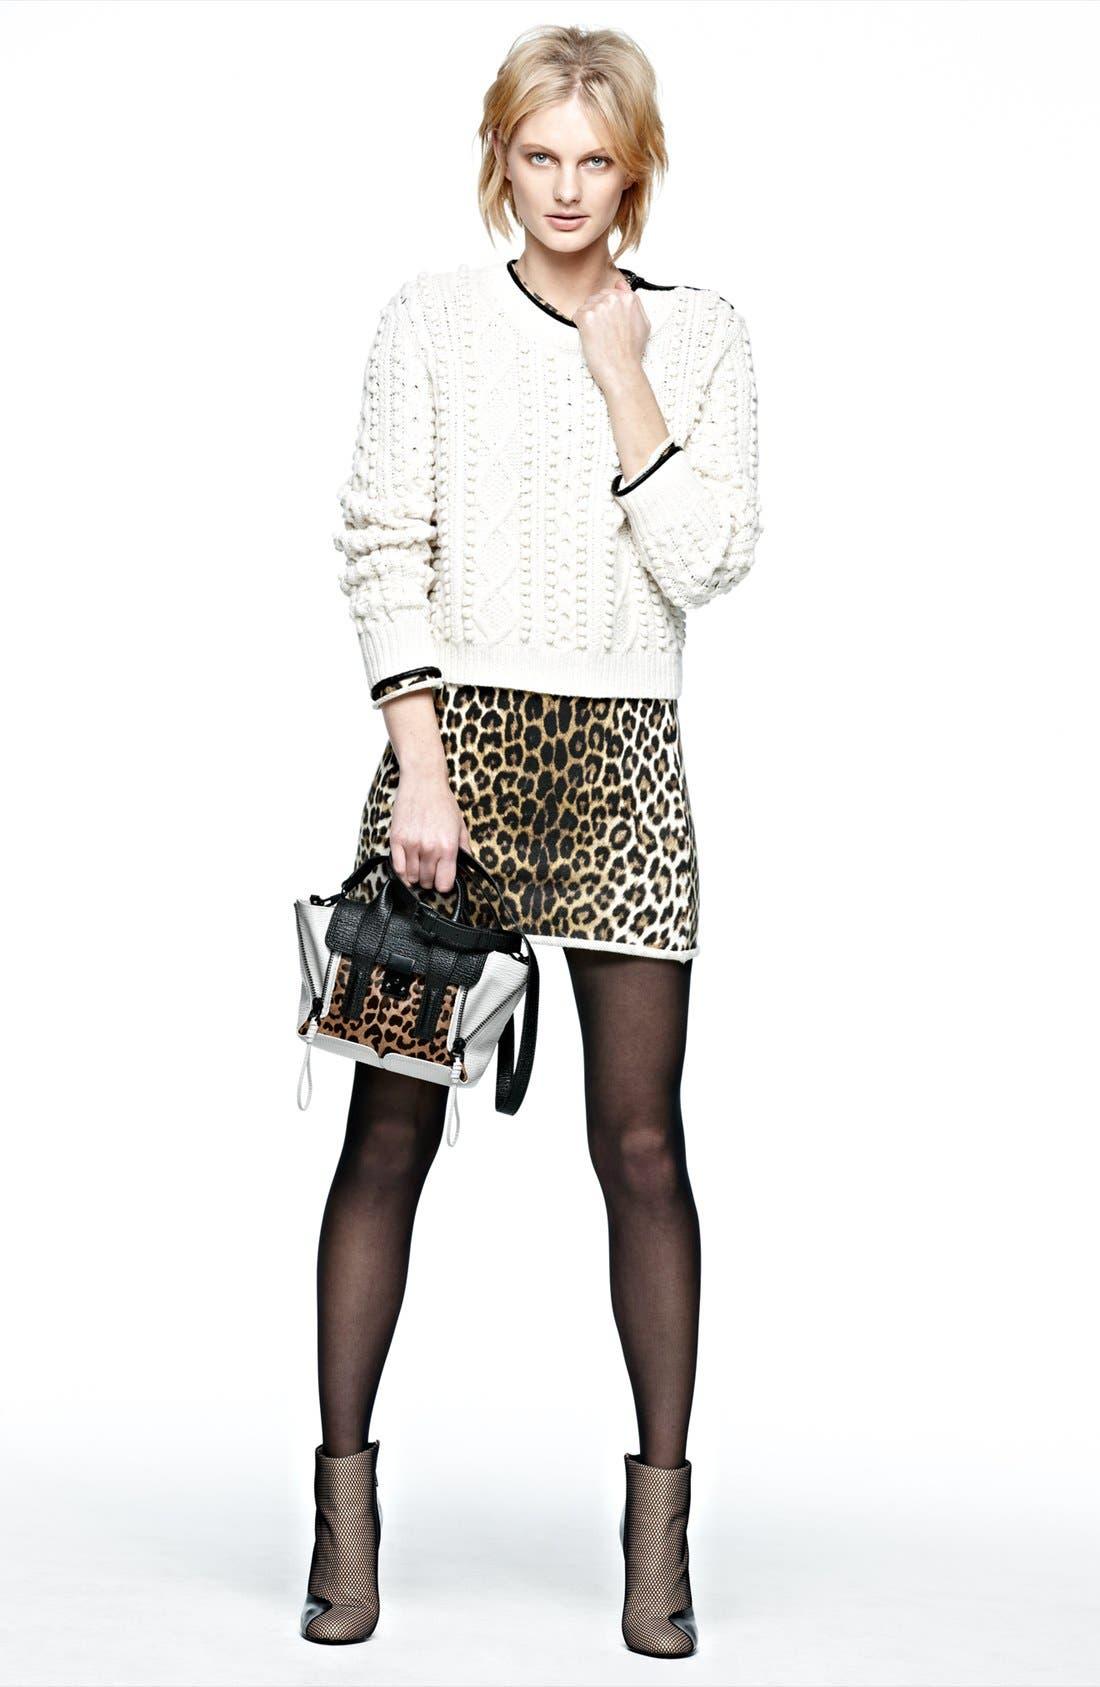 Main Image - 3.1 Philip Lim Sweater & Dress